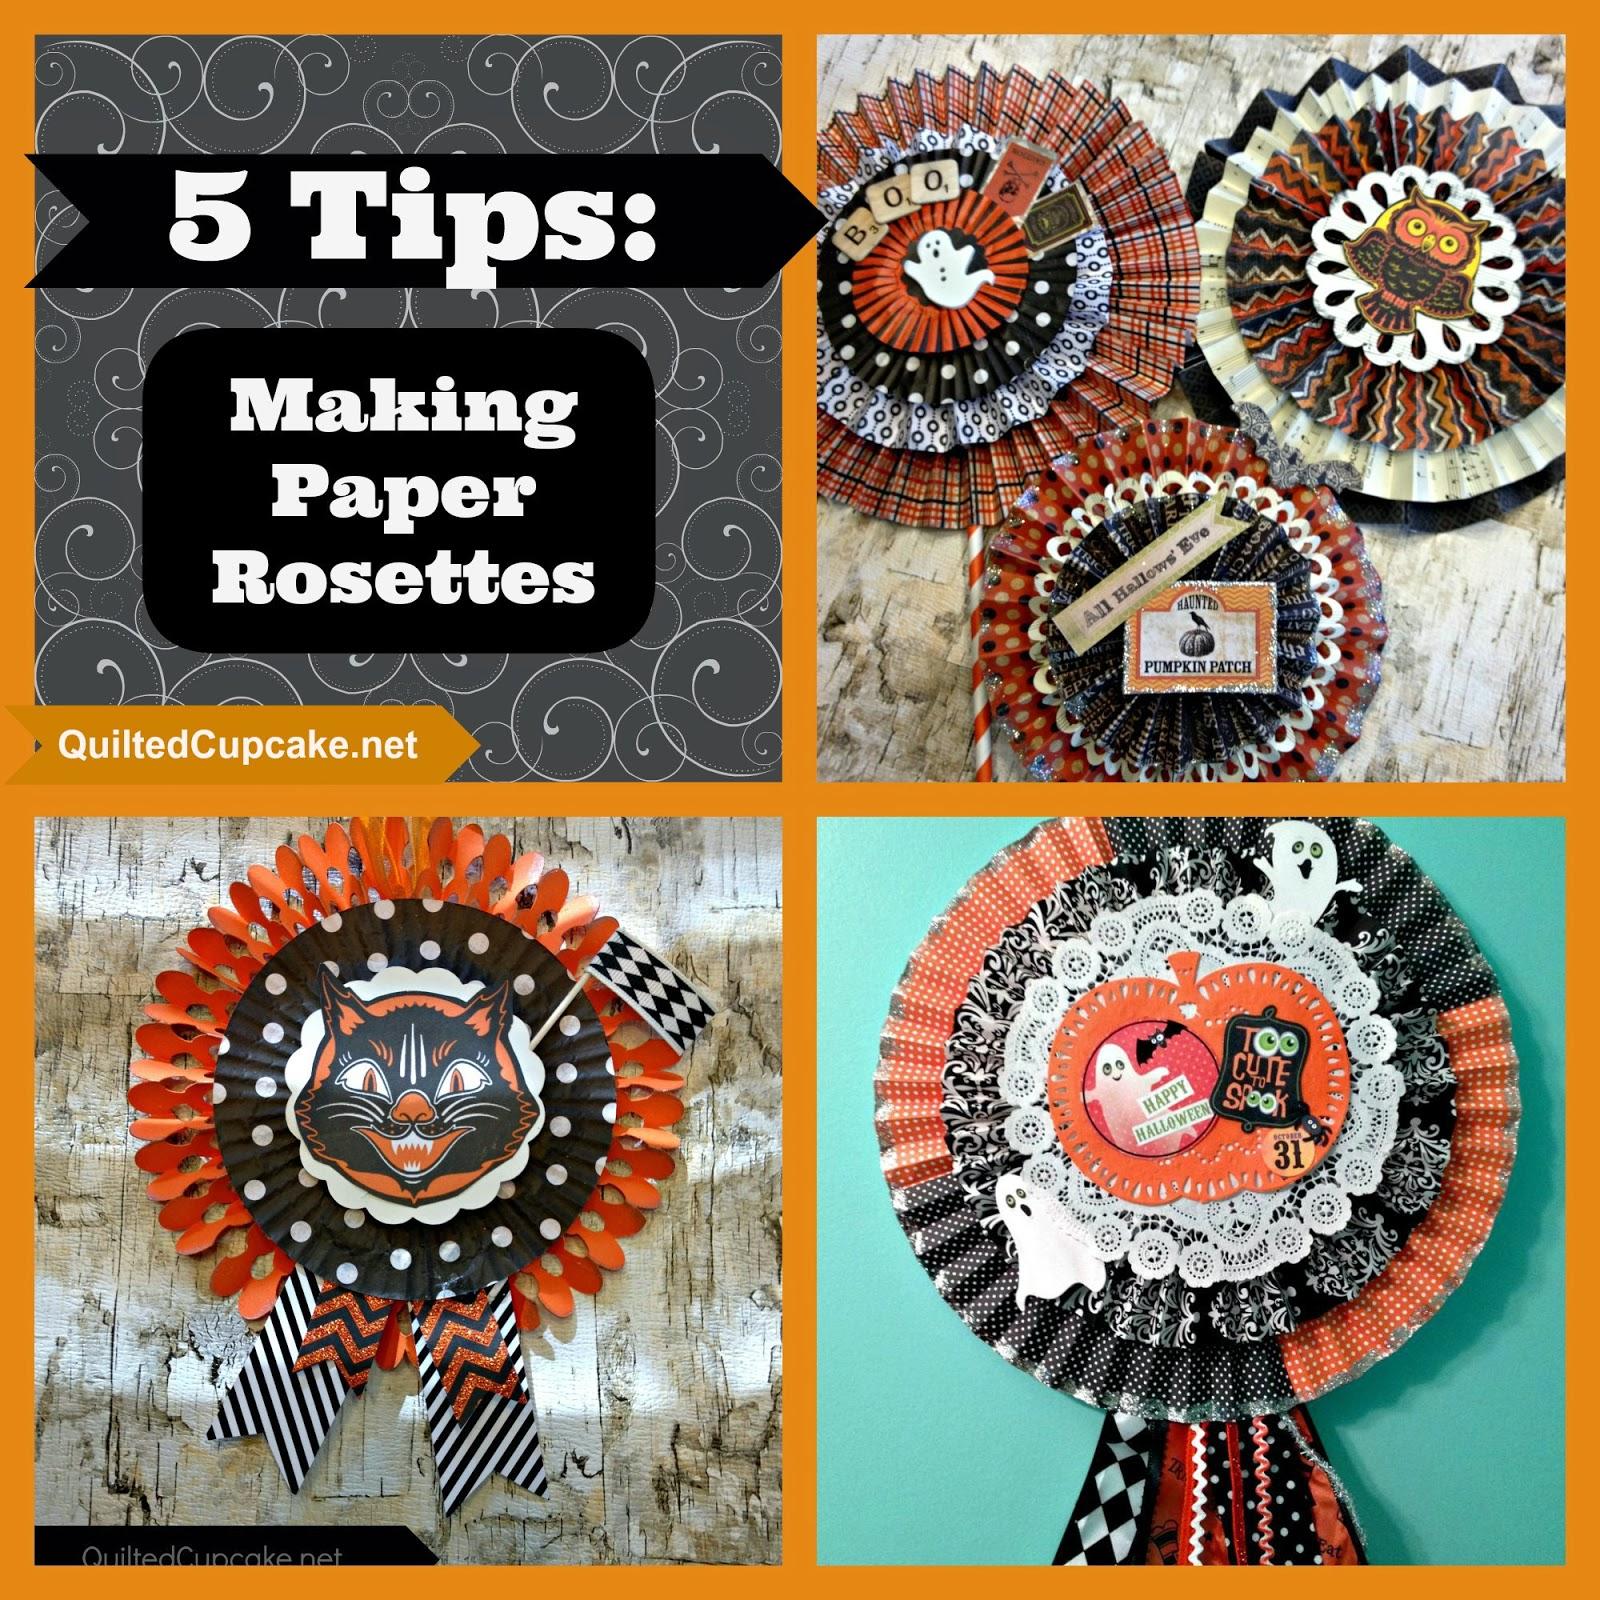 5 Tips For Making Paper Rosettes